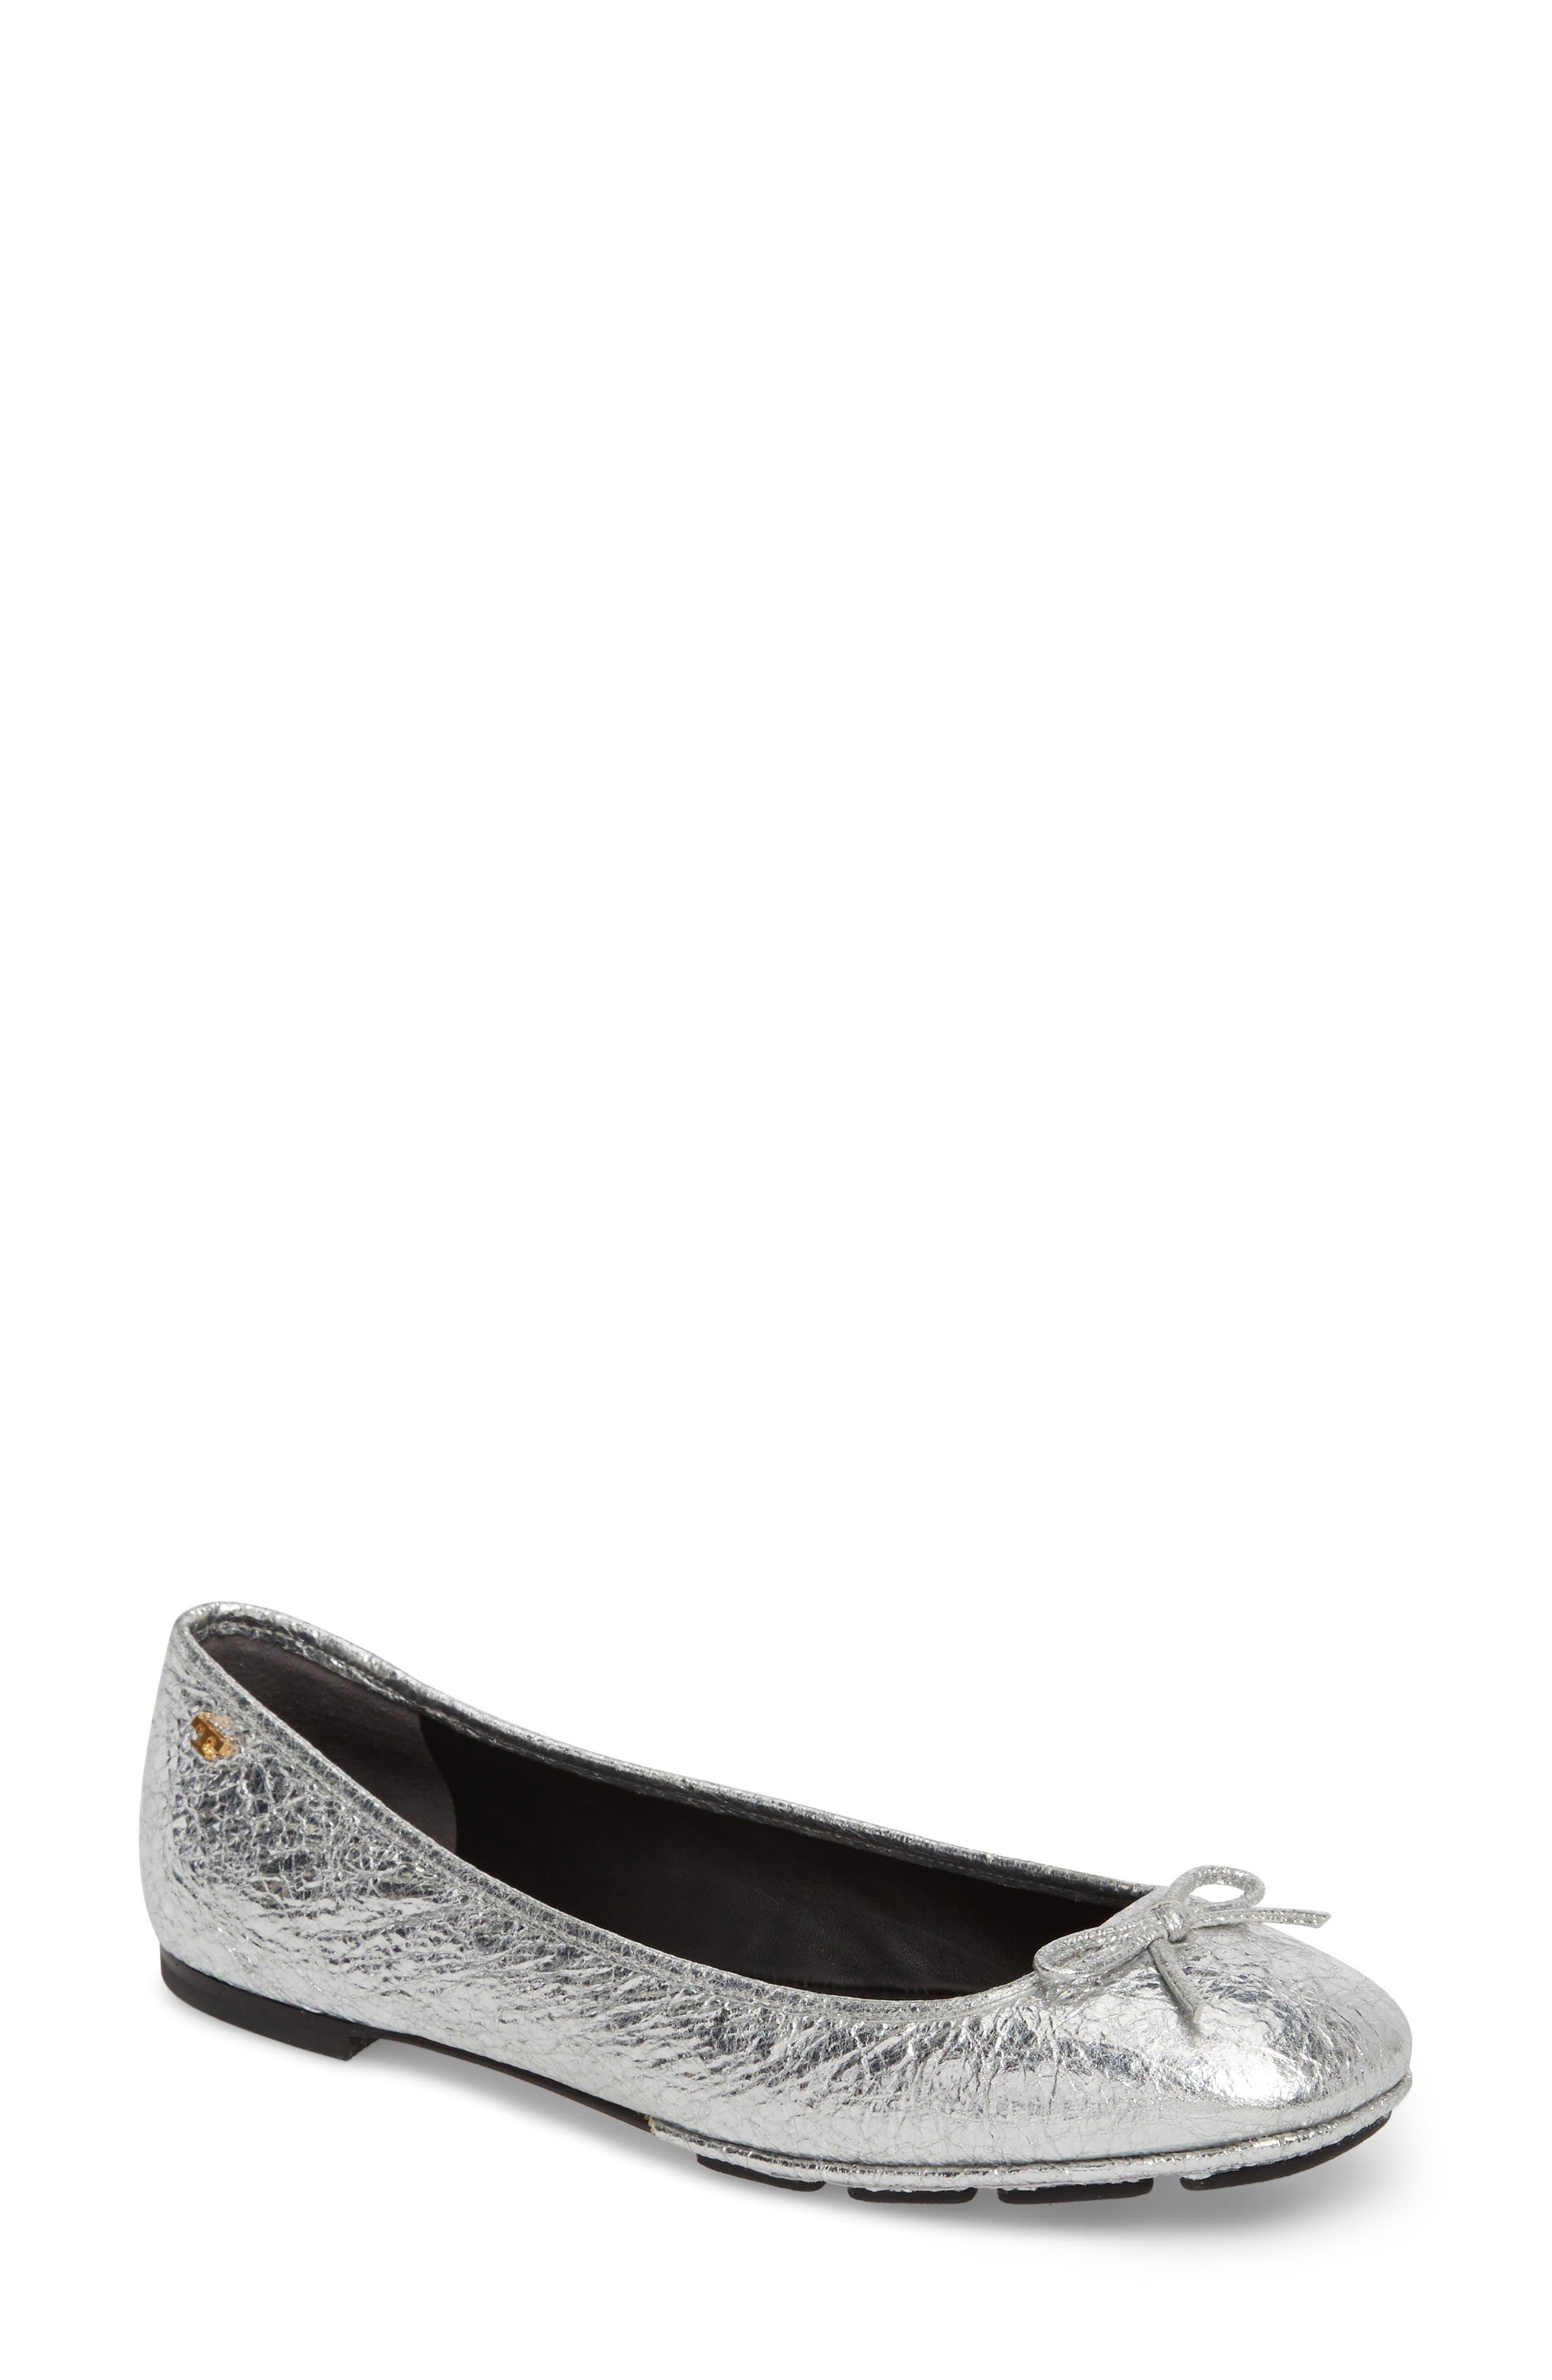 c432ddbda5 Tory Burch Laila 2 Metallic Leather Driver Ballet Flats In Silver/ Perfect  Black